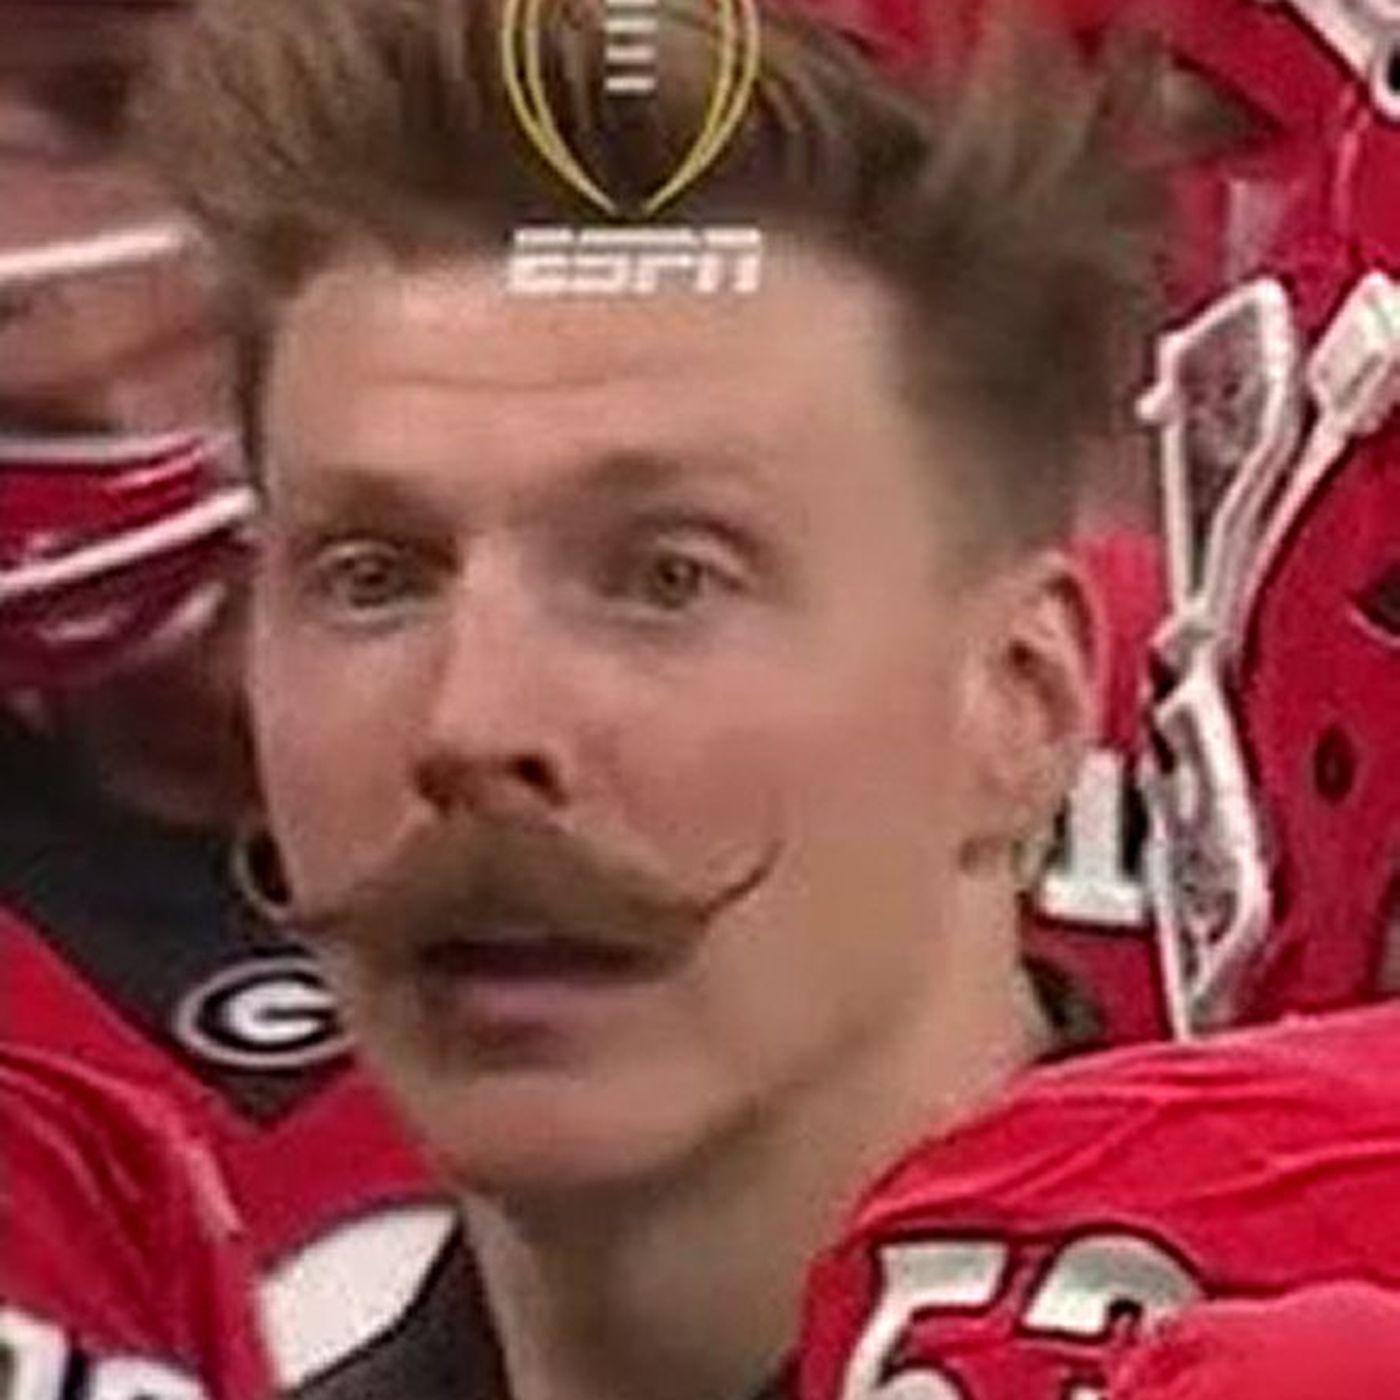 Georgia mustache coach is headed to Oregon - SBNation com